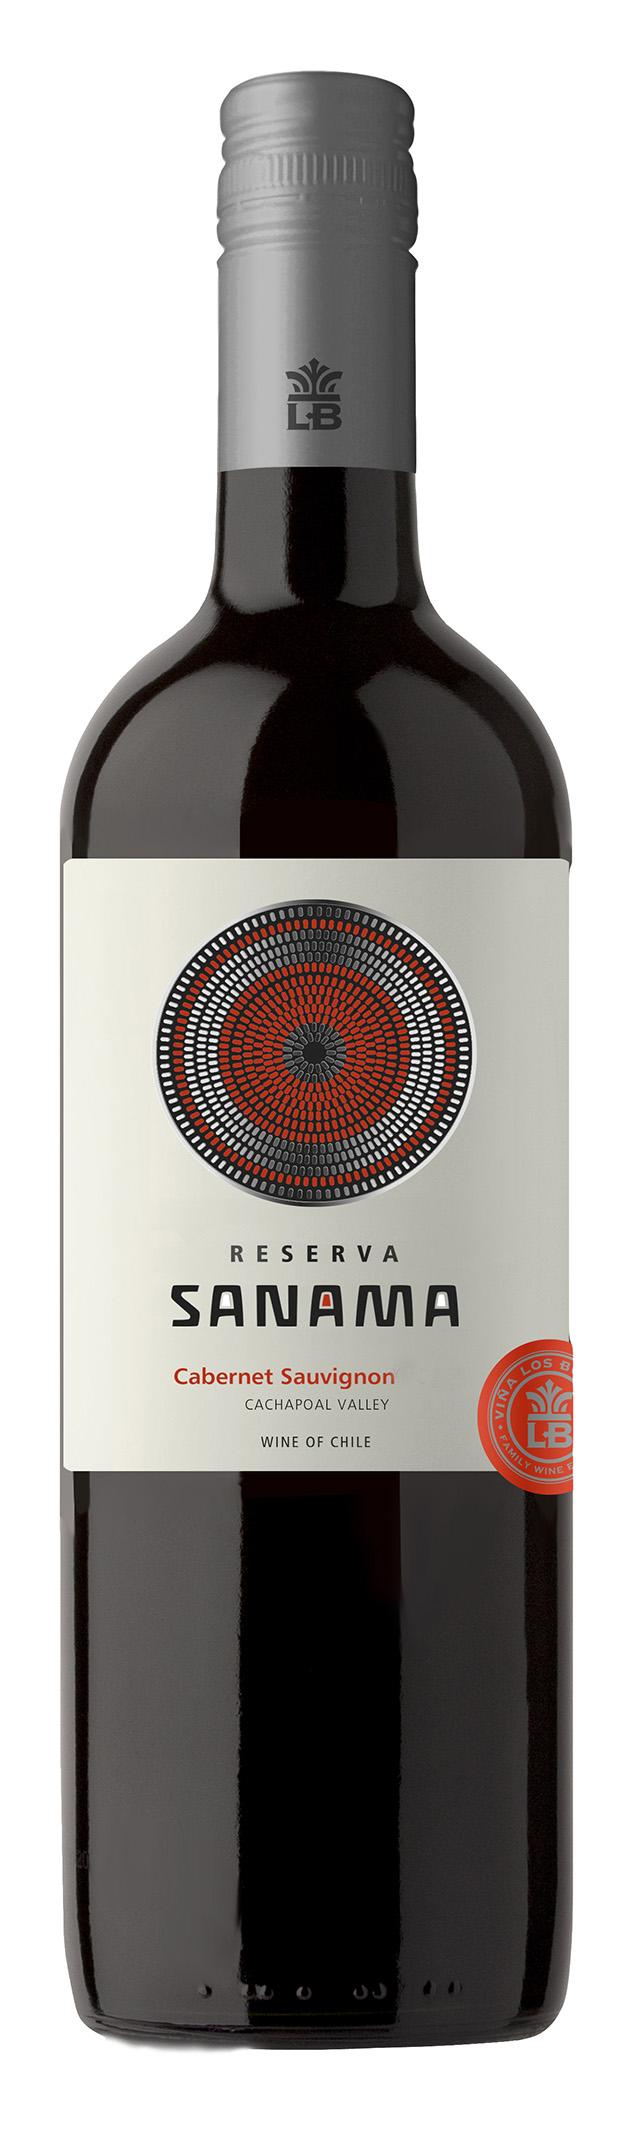 Sanama Reserva, Cachapoal Andes Cabernet Sauvignon/Syrah 2016